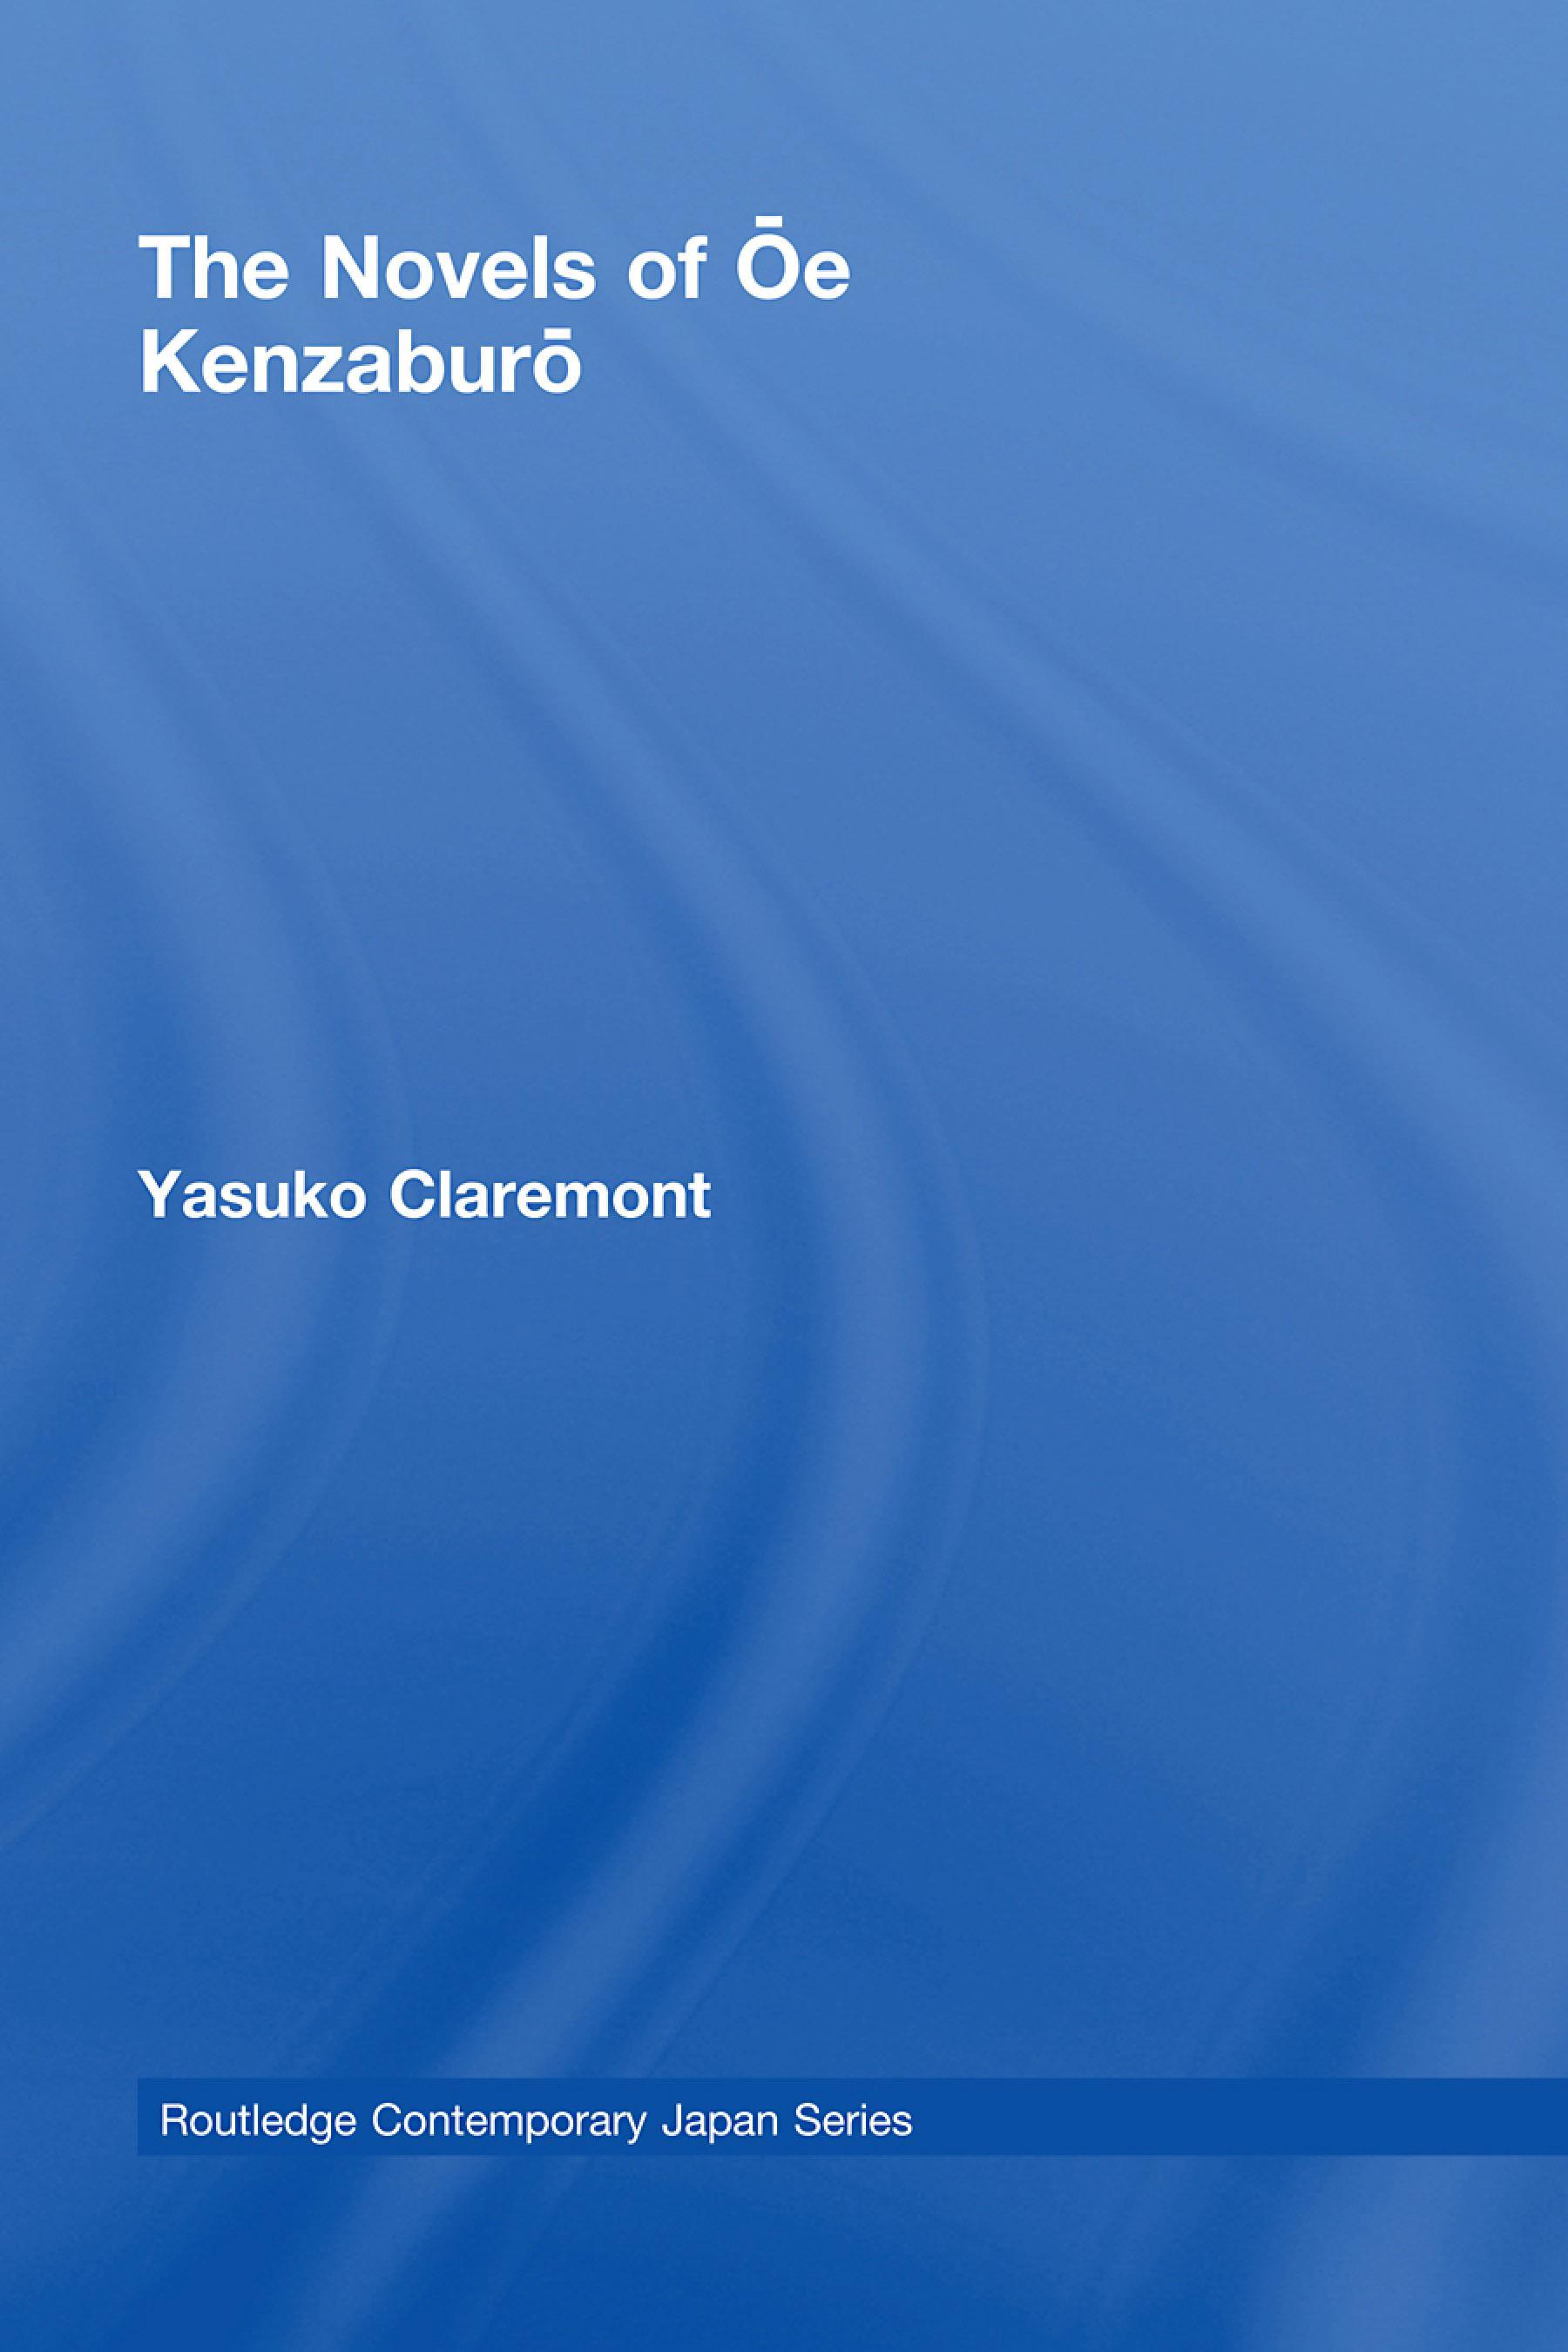 The Novels of Oe Kenzaburo EB9780203884010